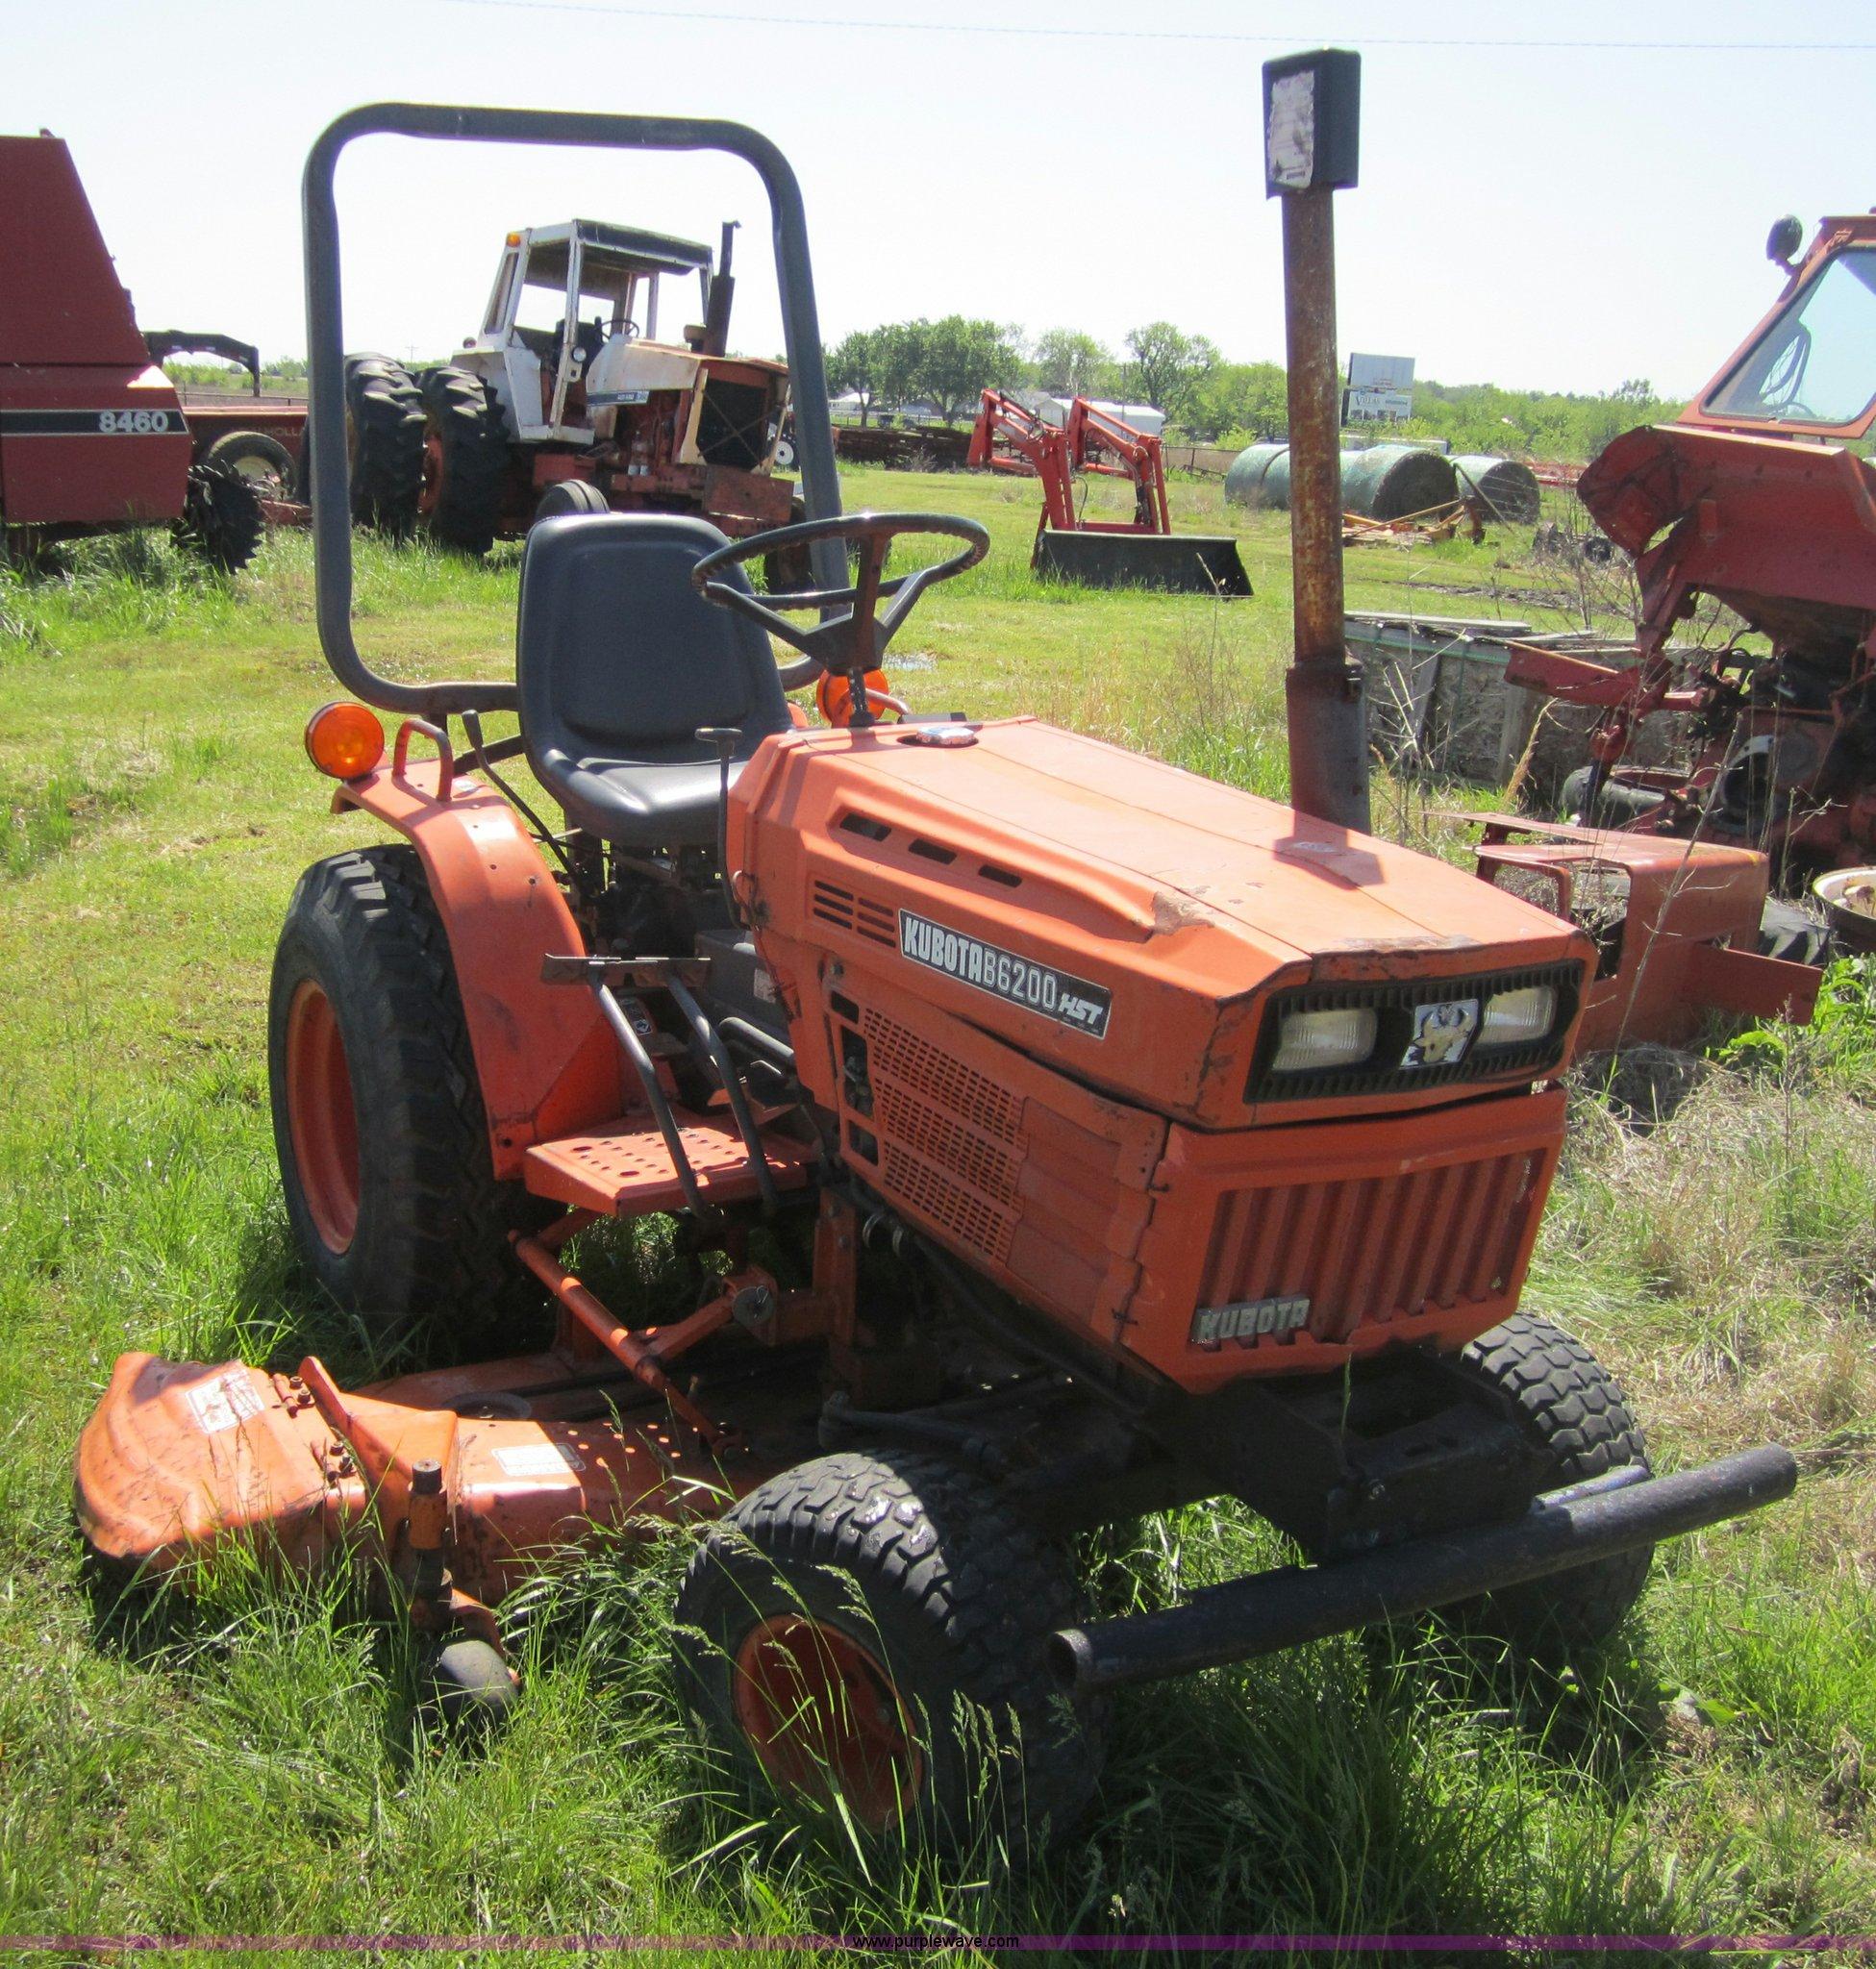 Kubota B6200 Hst Lawn Tractor Item 3688 6 8 2011